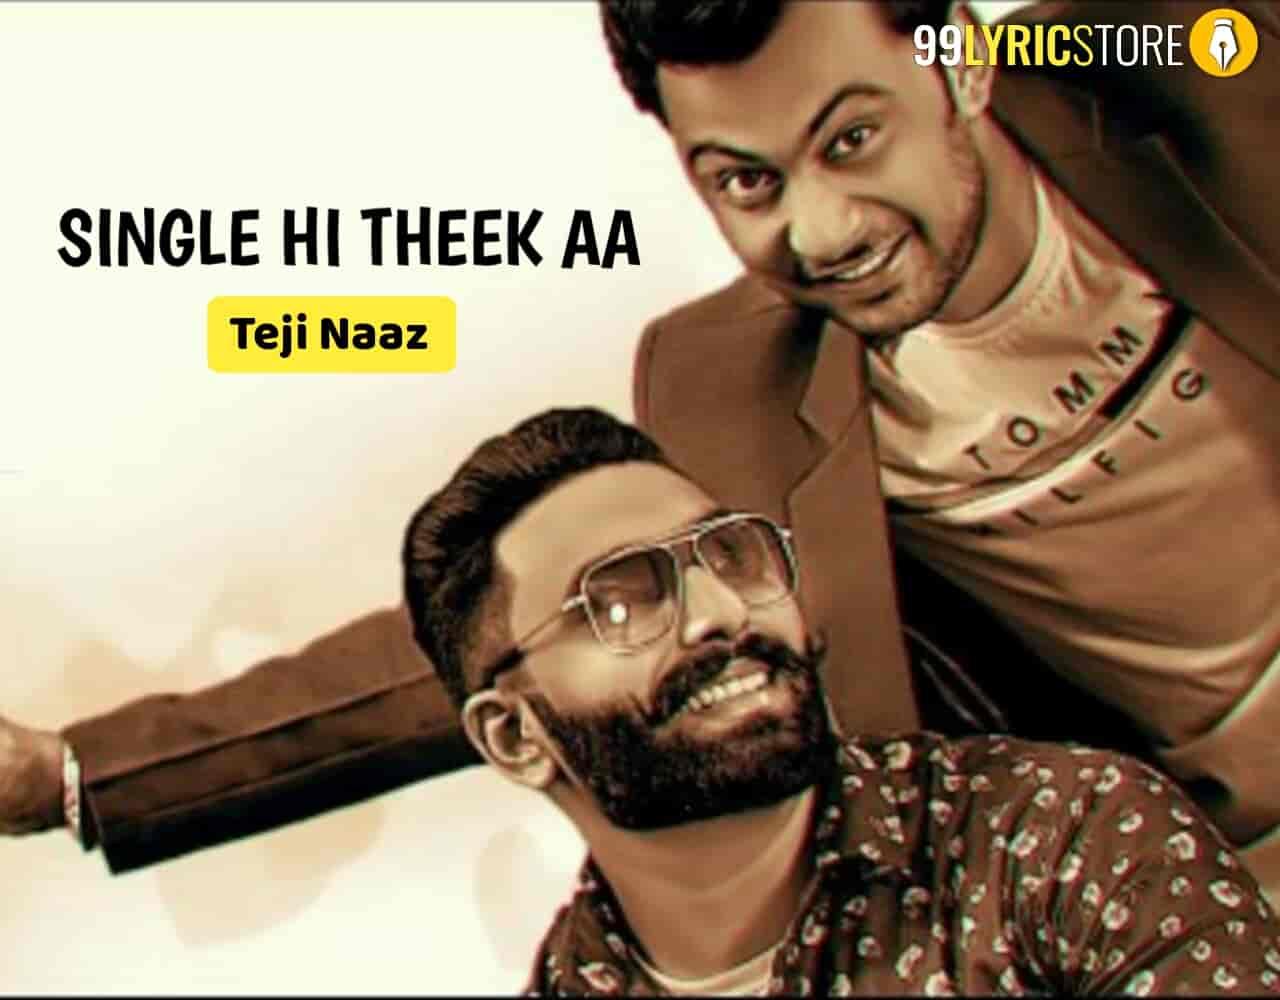 Single Hi Theek Aa Punjabi Song Sung by Teji Naaz